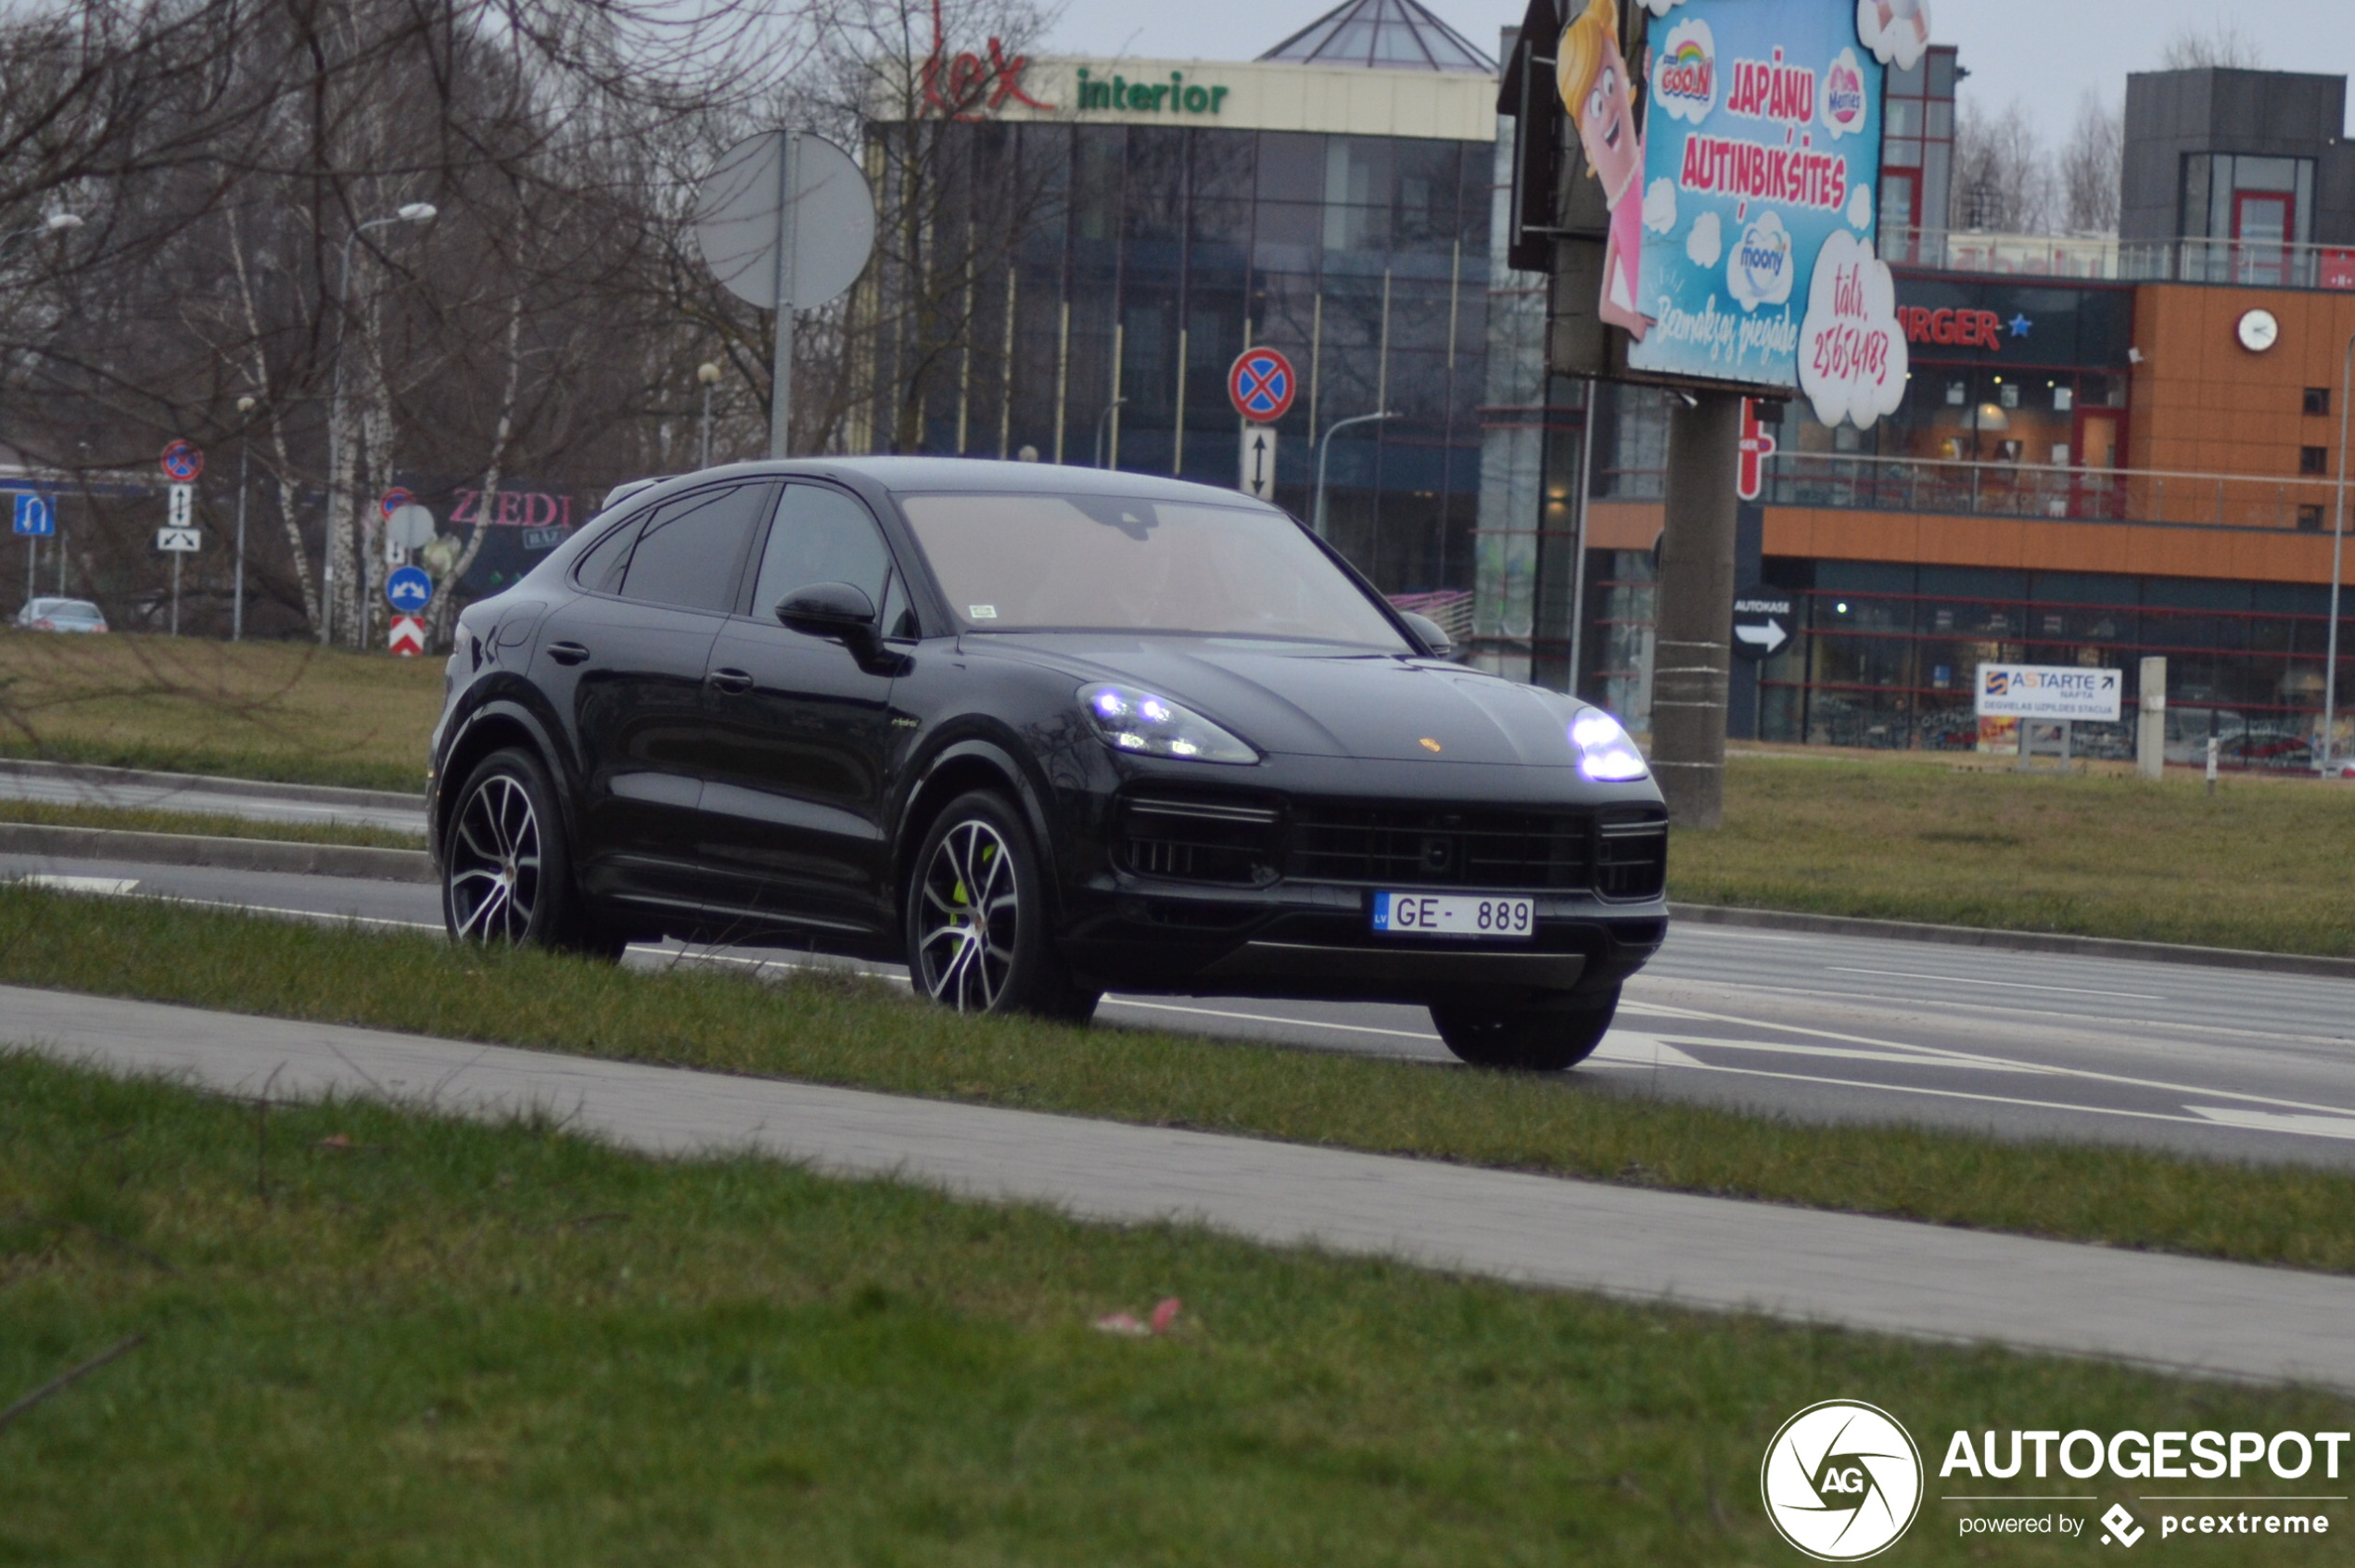 Porsche Cayenne Coupe Turbo S E Hybrid 3 March 2020 Autogespot